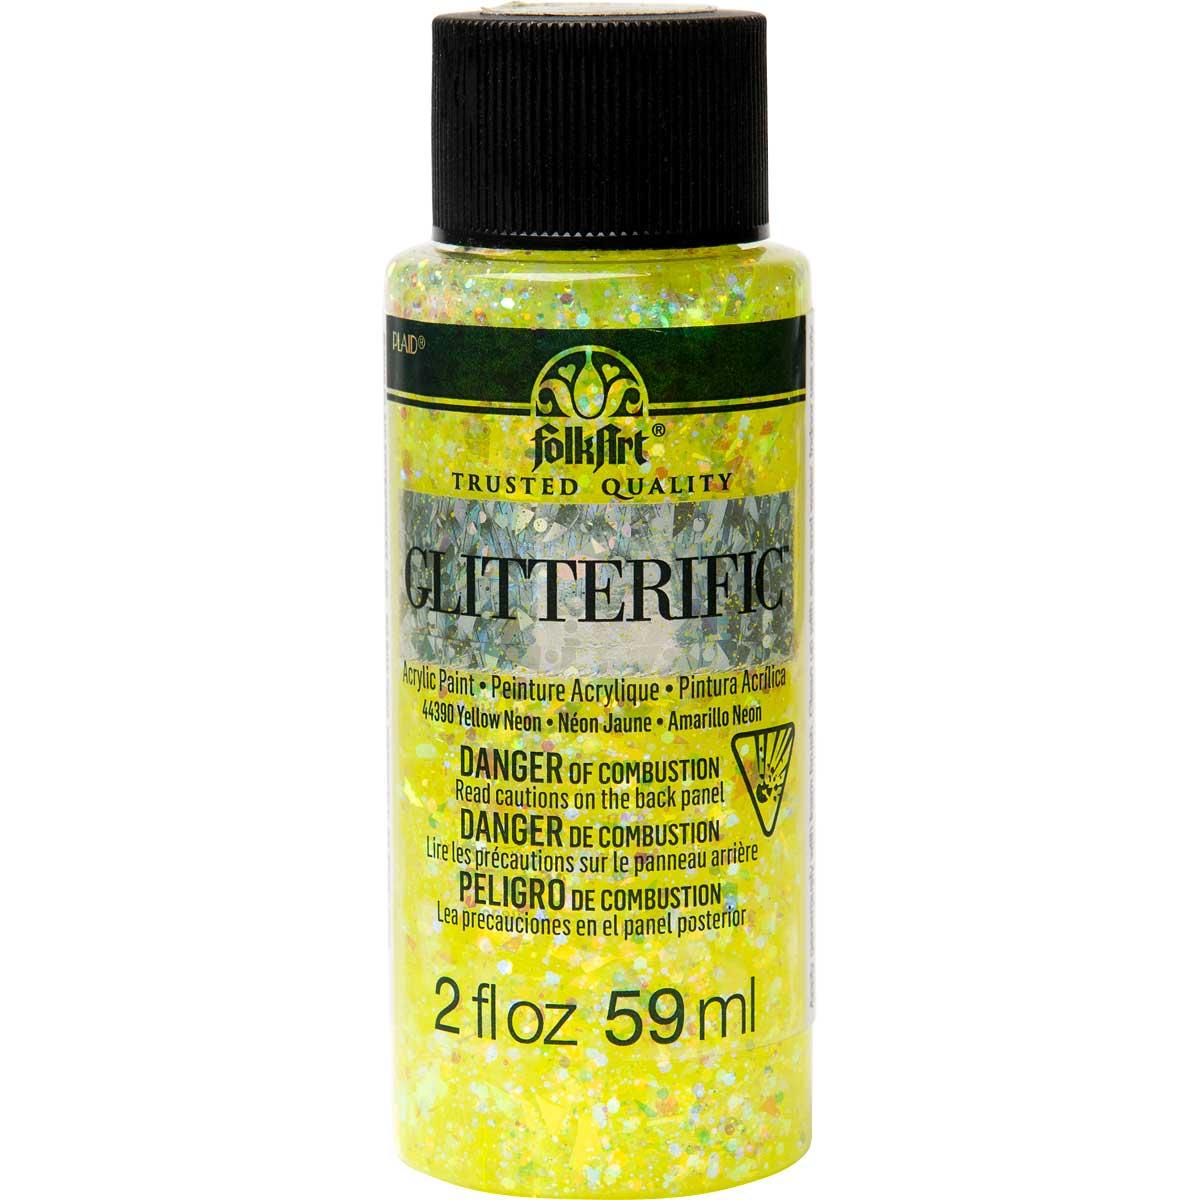 FolkArt ® Glitterific™ Acrylic Paint - Neon Yellow, 2 oz.